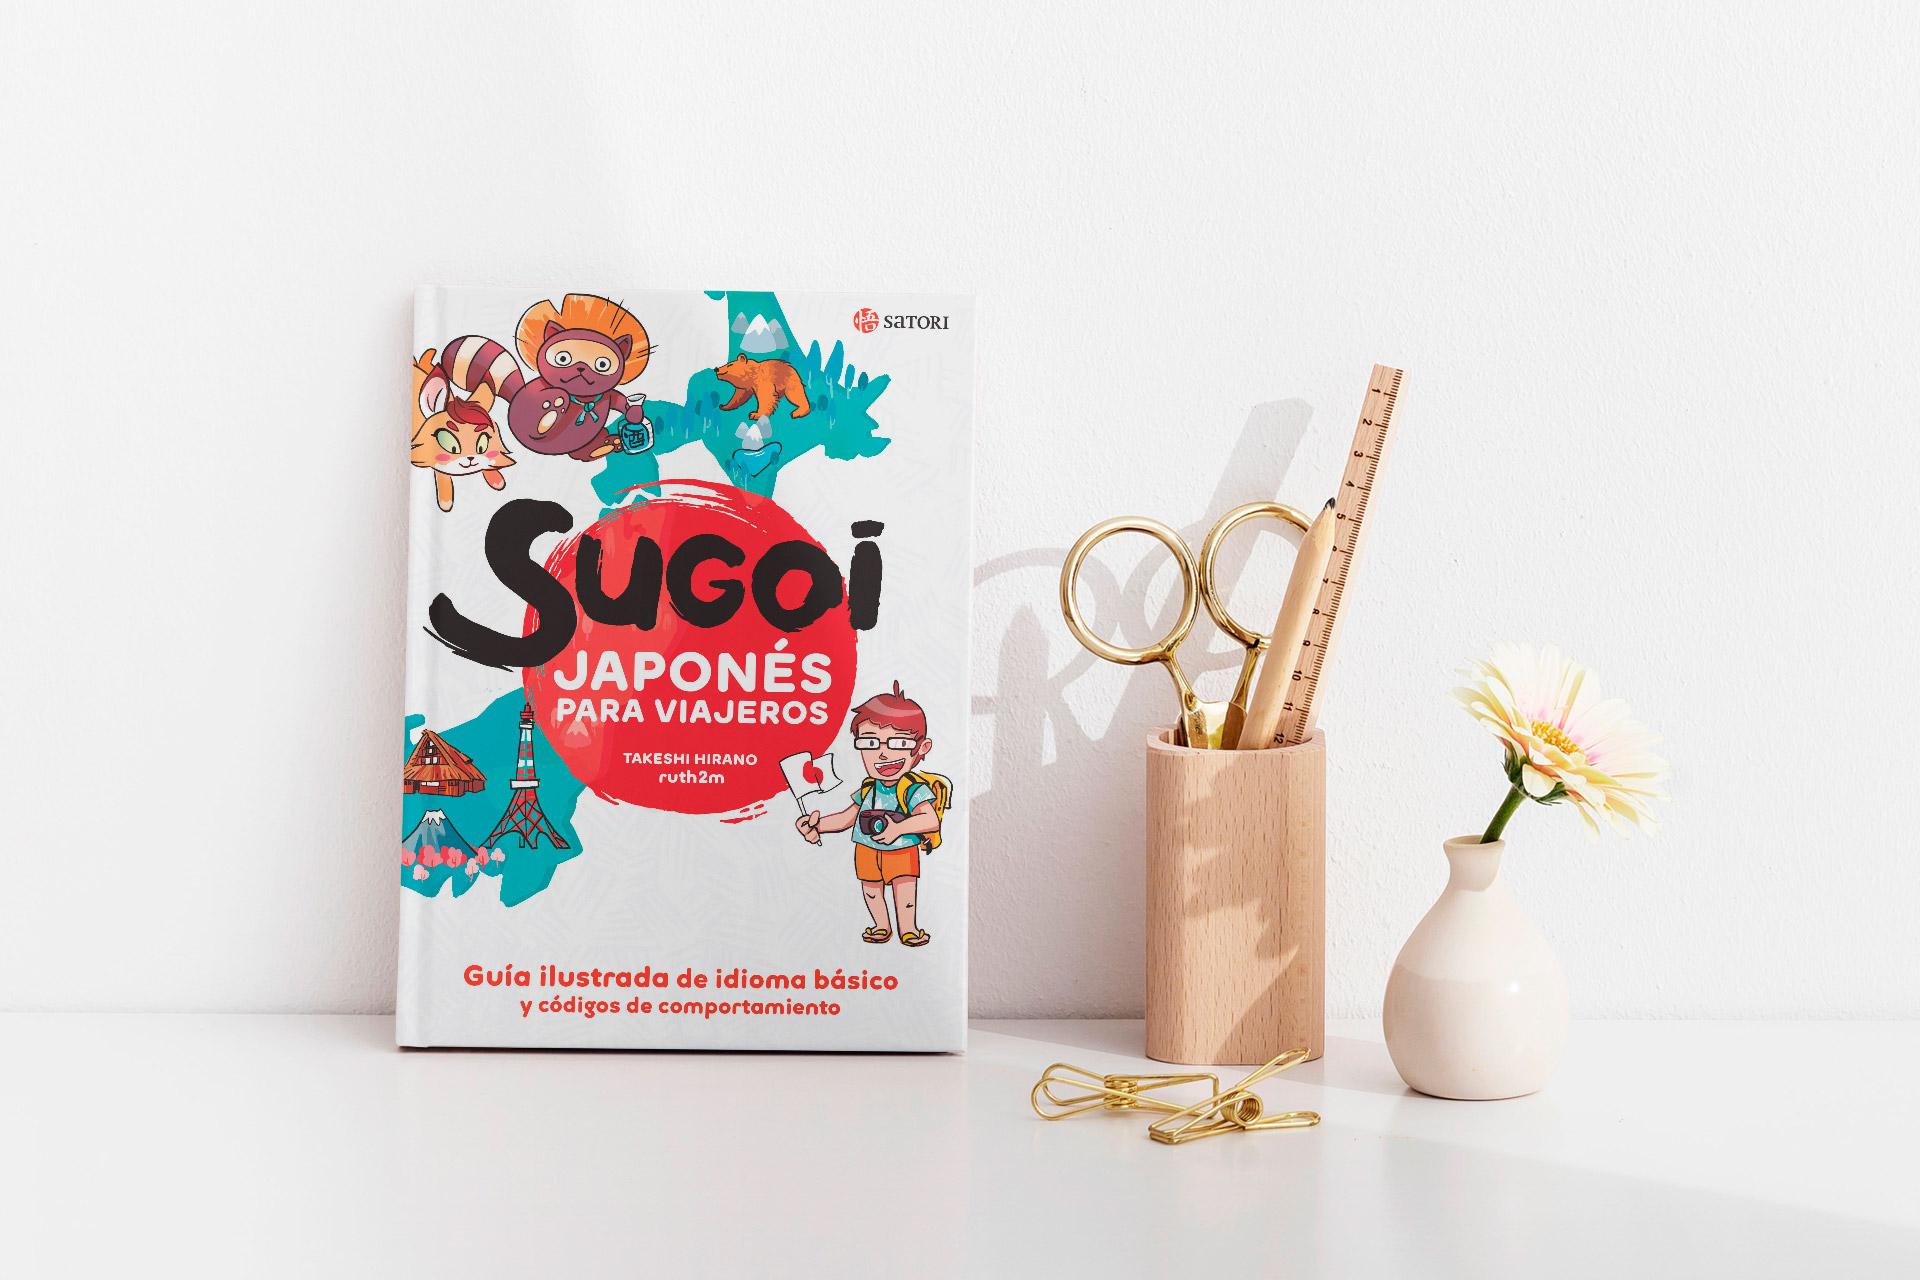 Libro Sugoi - Japonés para viajeros